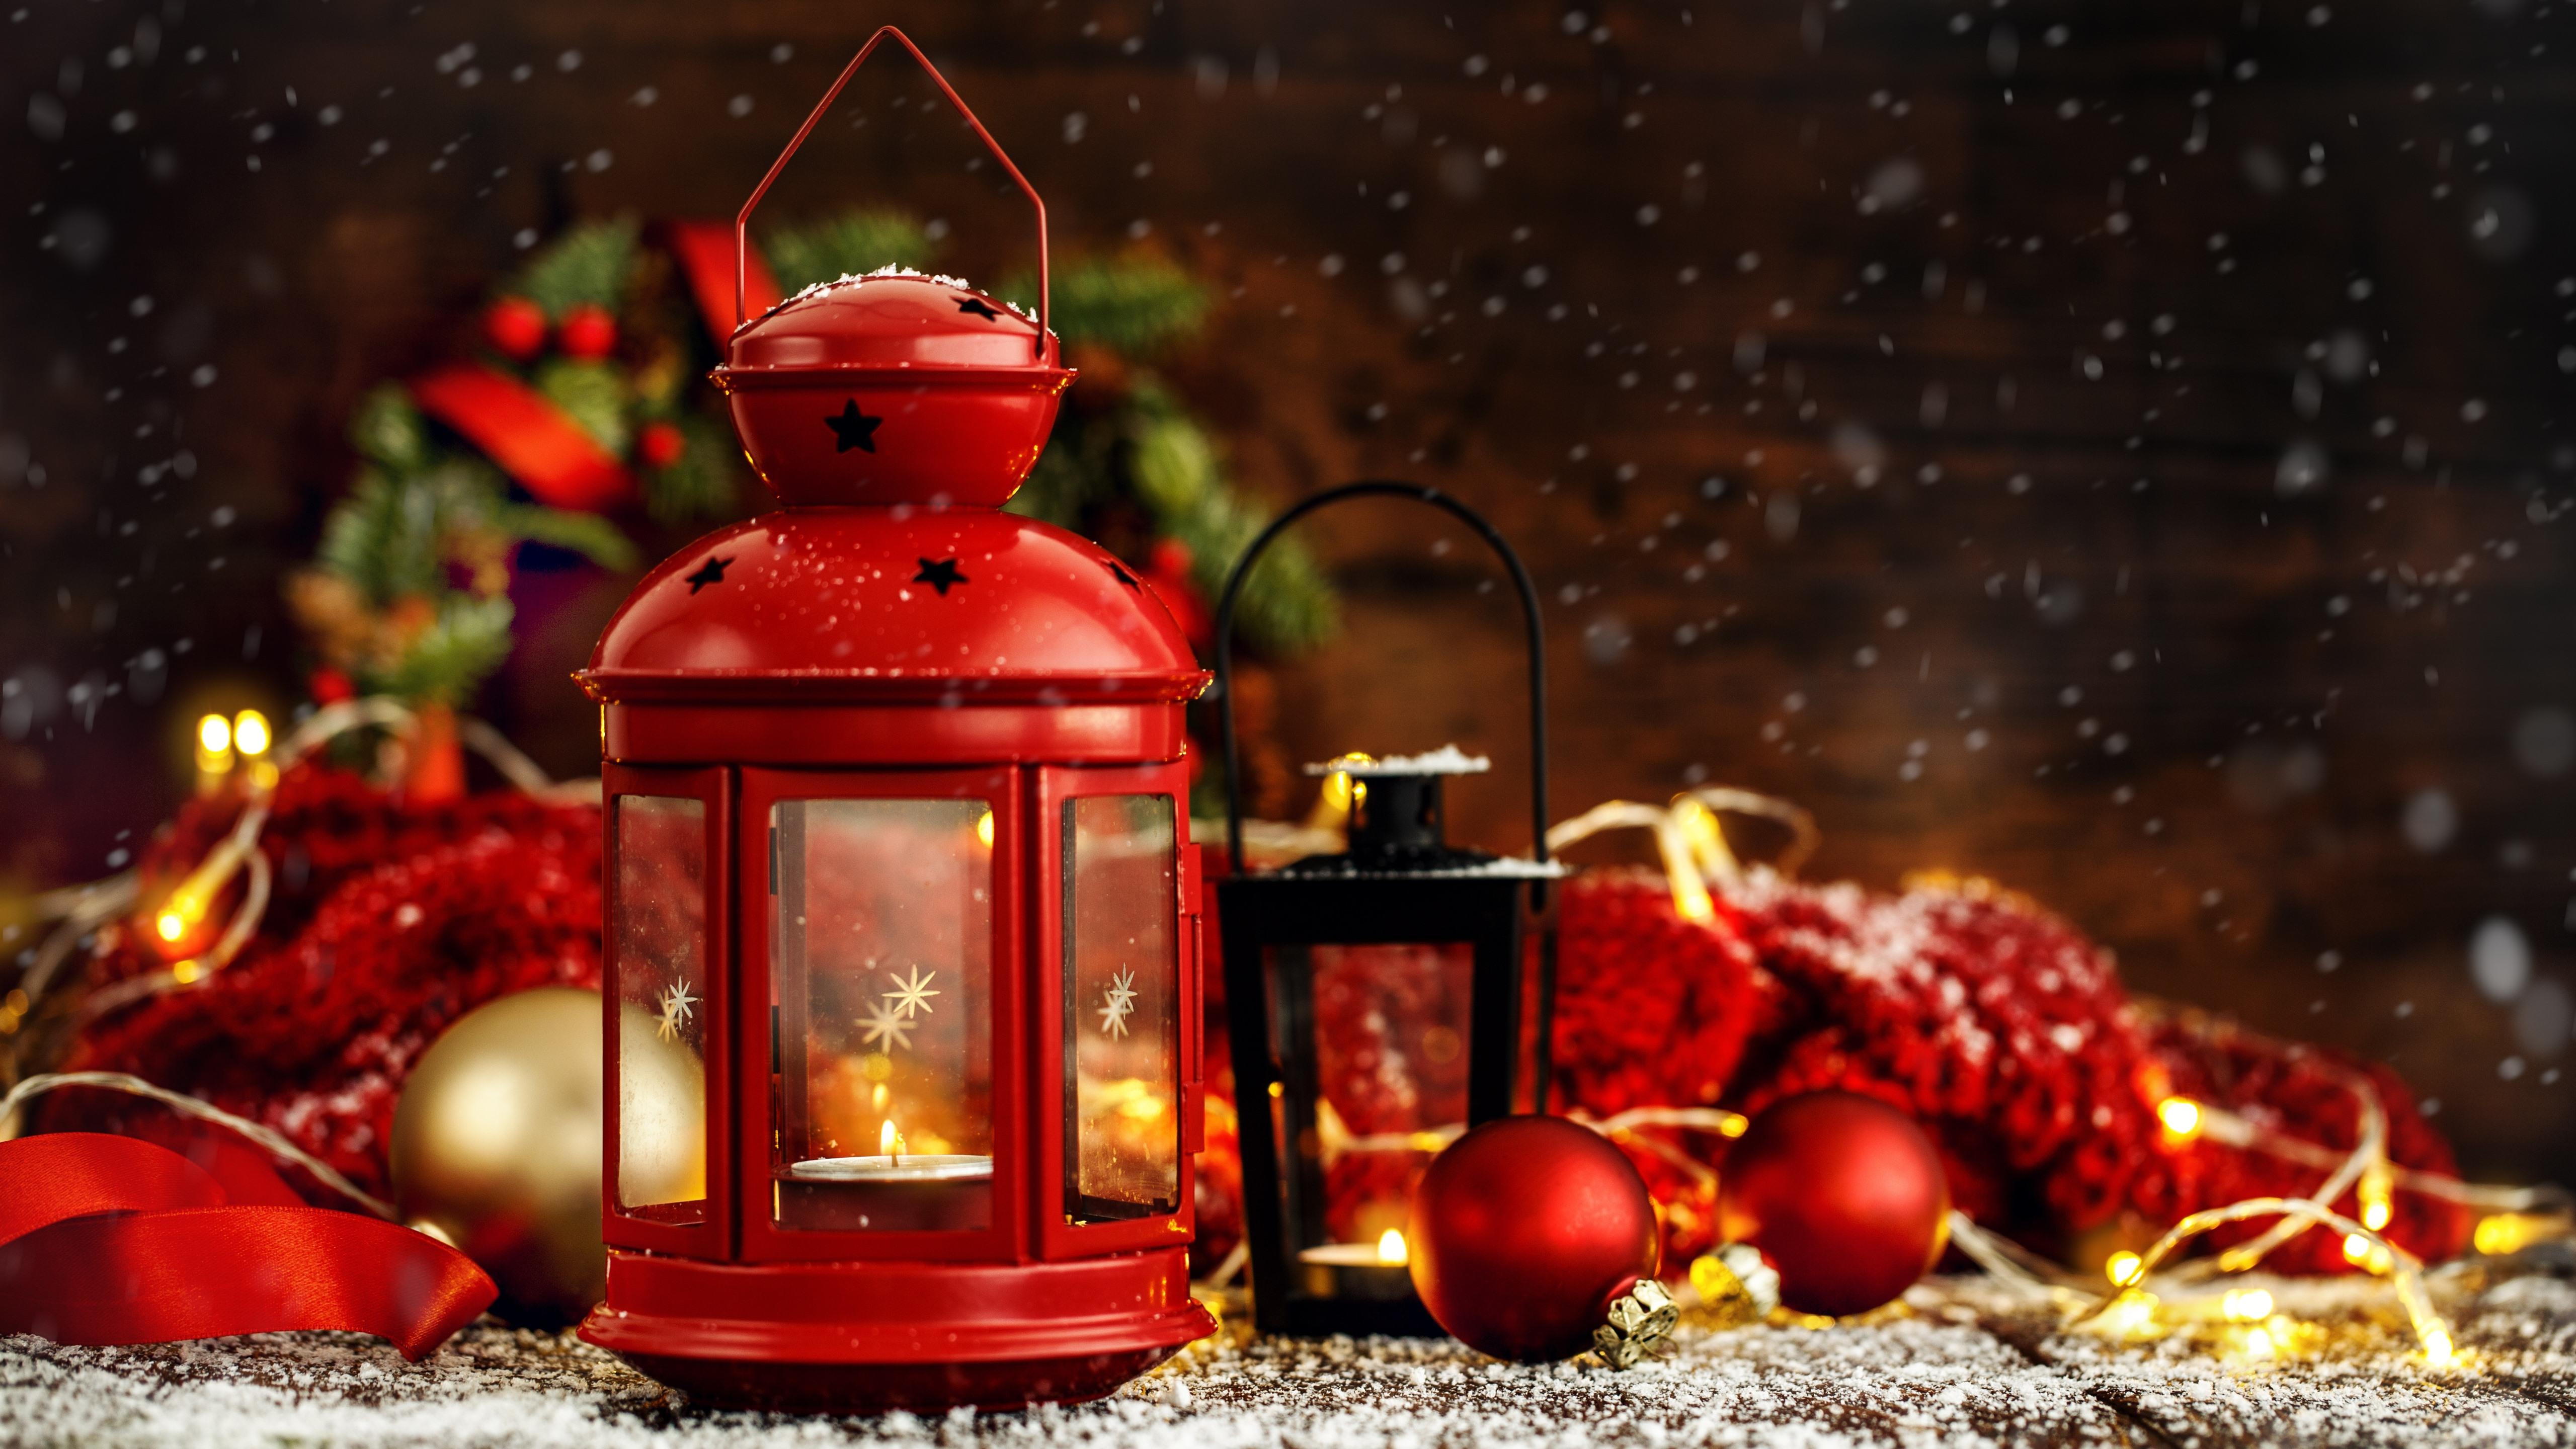 Wallpaper Red Lantern Christmas Balls Decoration 5120x2880